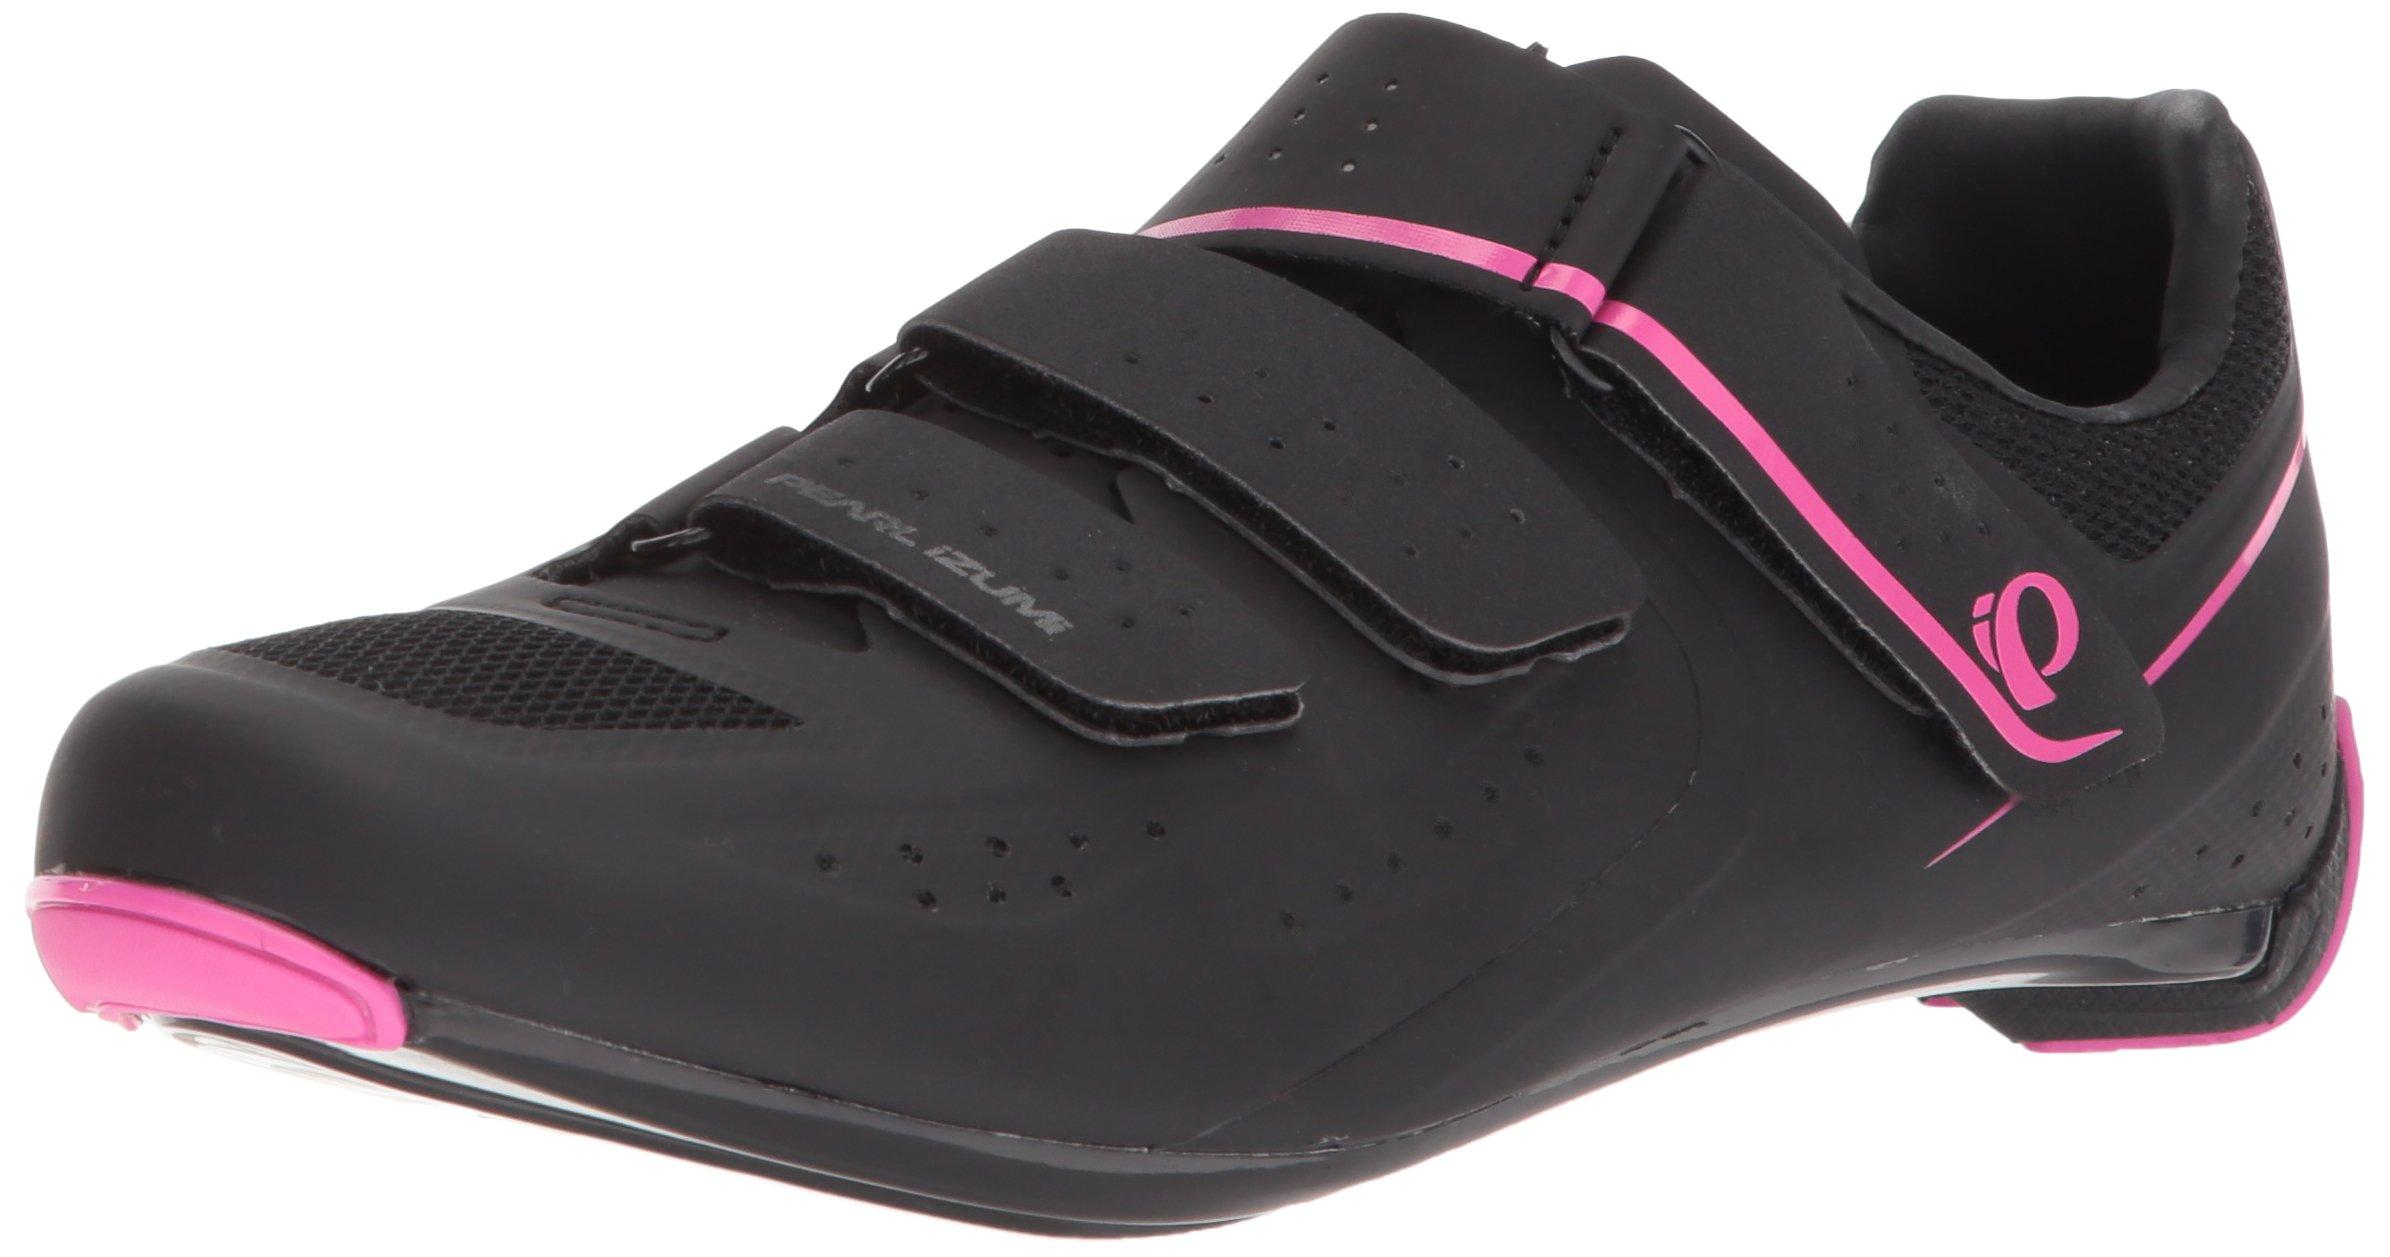 Pearl Izumi Women's W Select Road v5 Studio Cycling Shoe, Black/Black, 38.0 M EU (6.8 US)